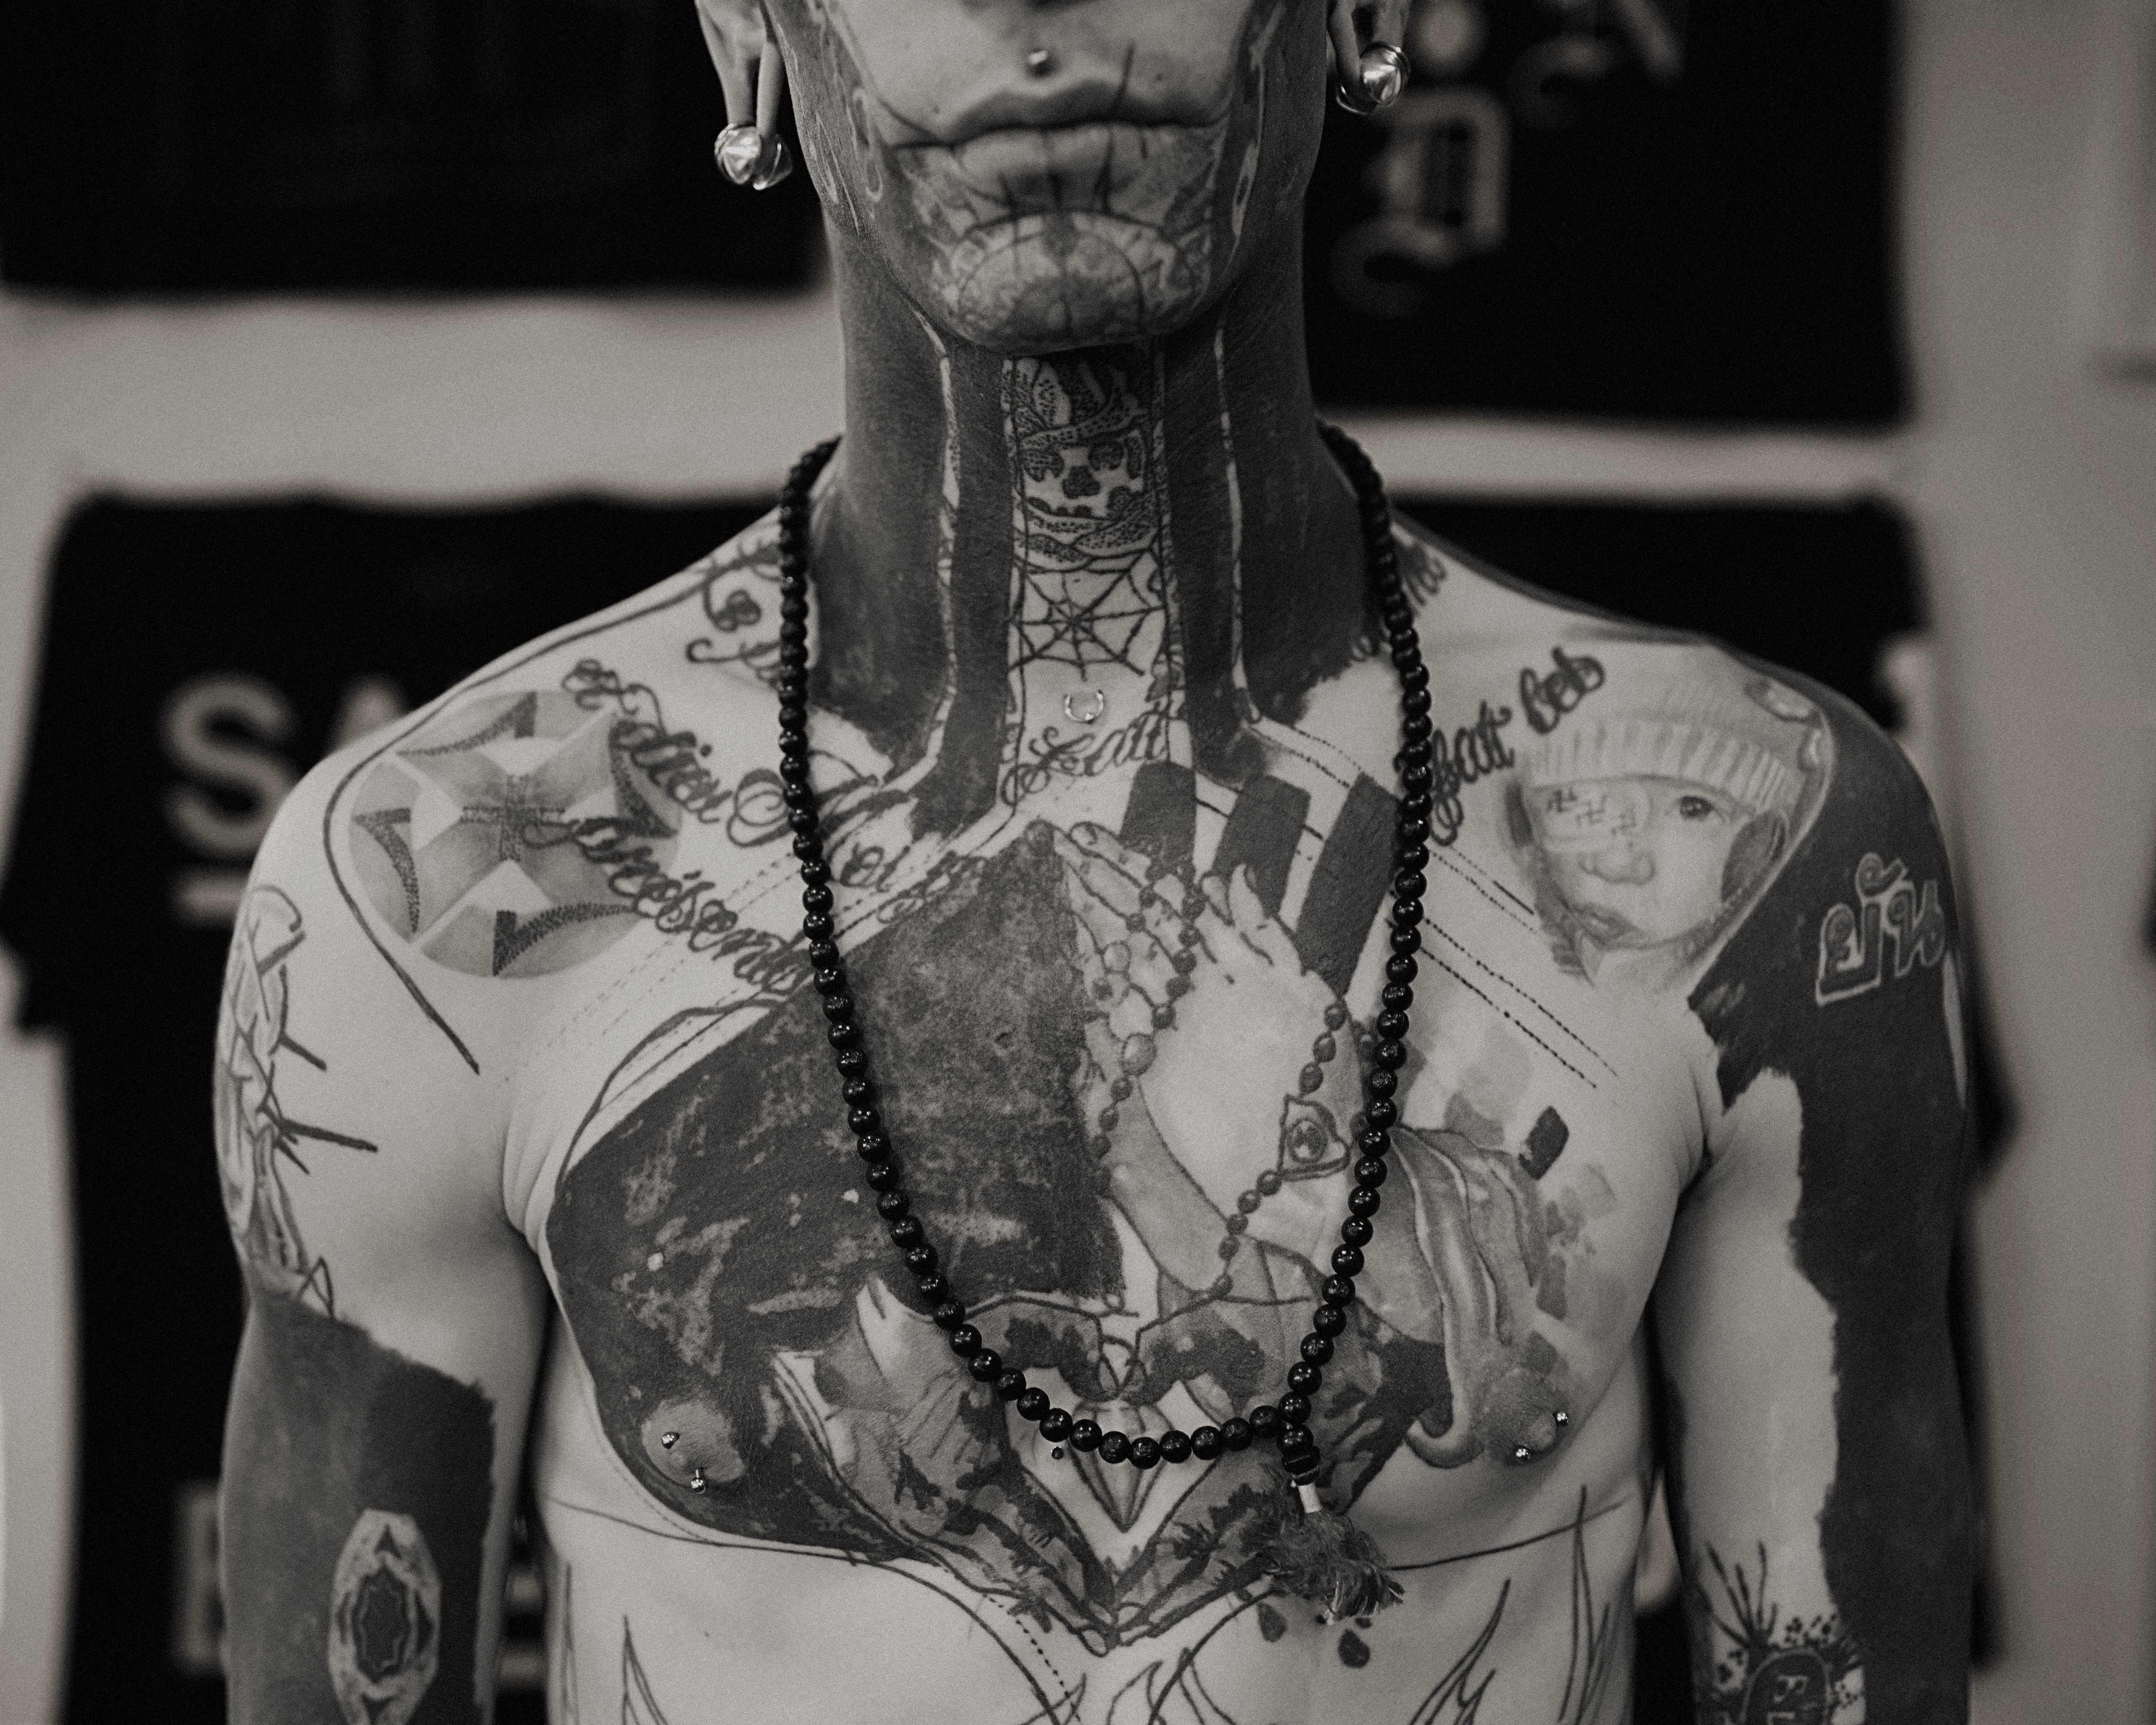 Yann portrait